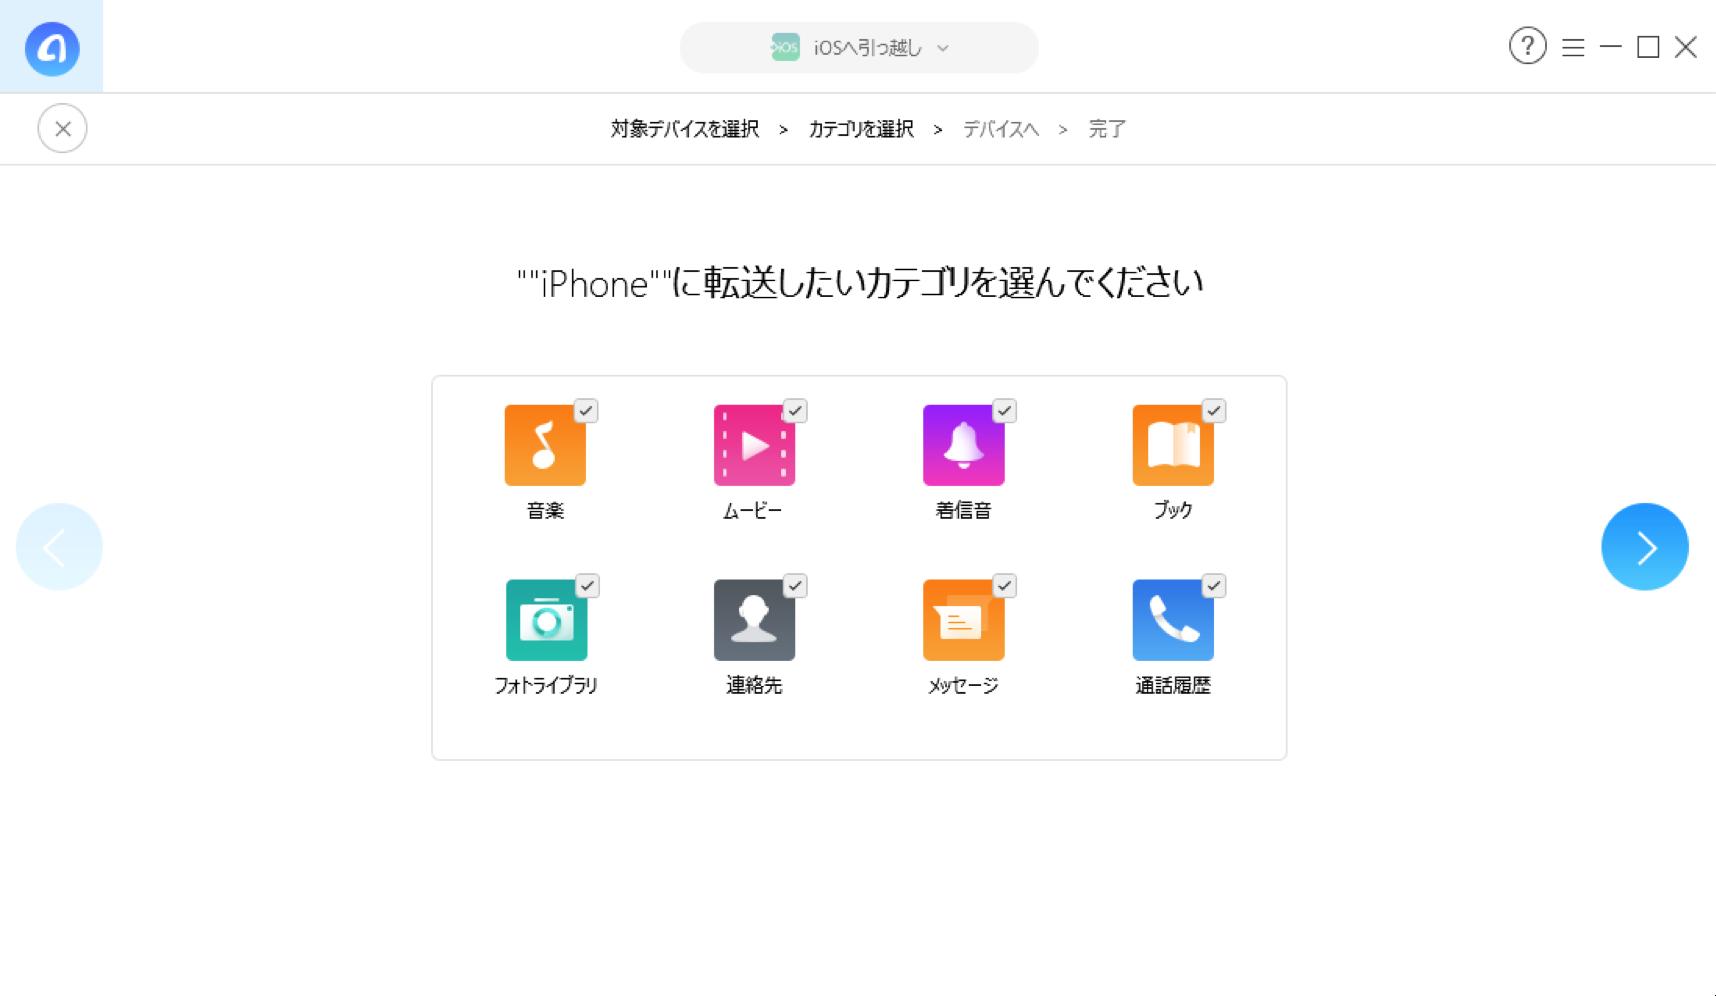 AnyTrans for iOSでAndroidからiPhone 8/X/7などへデータを移行する